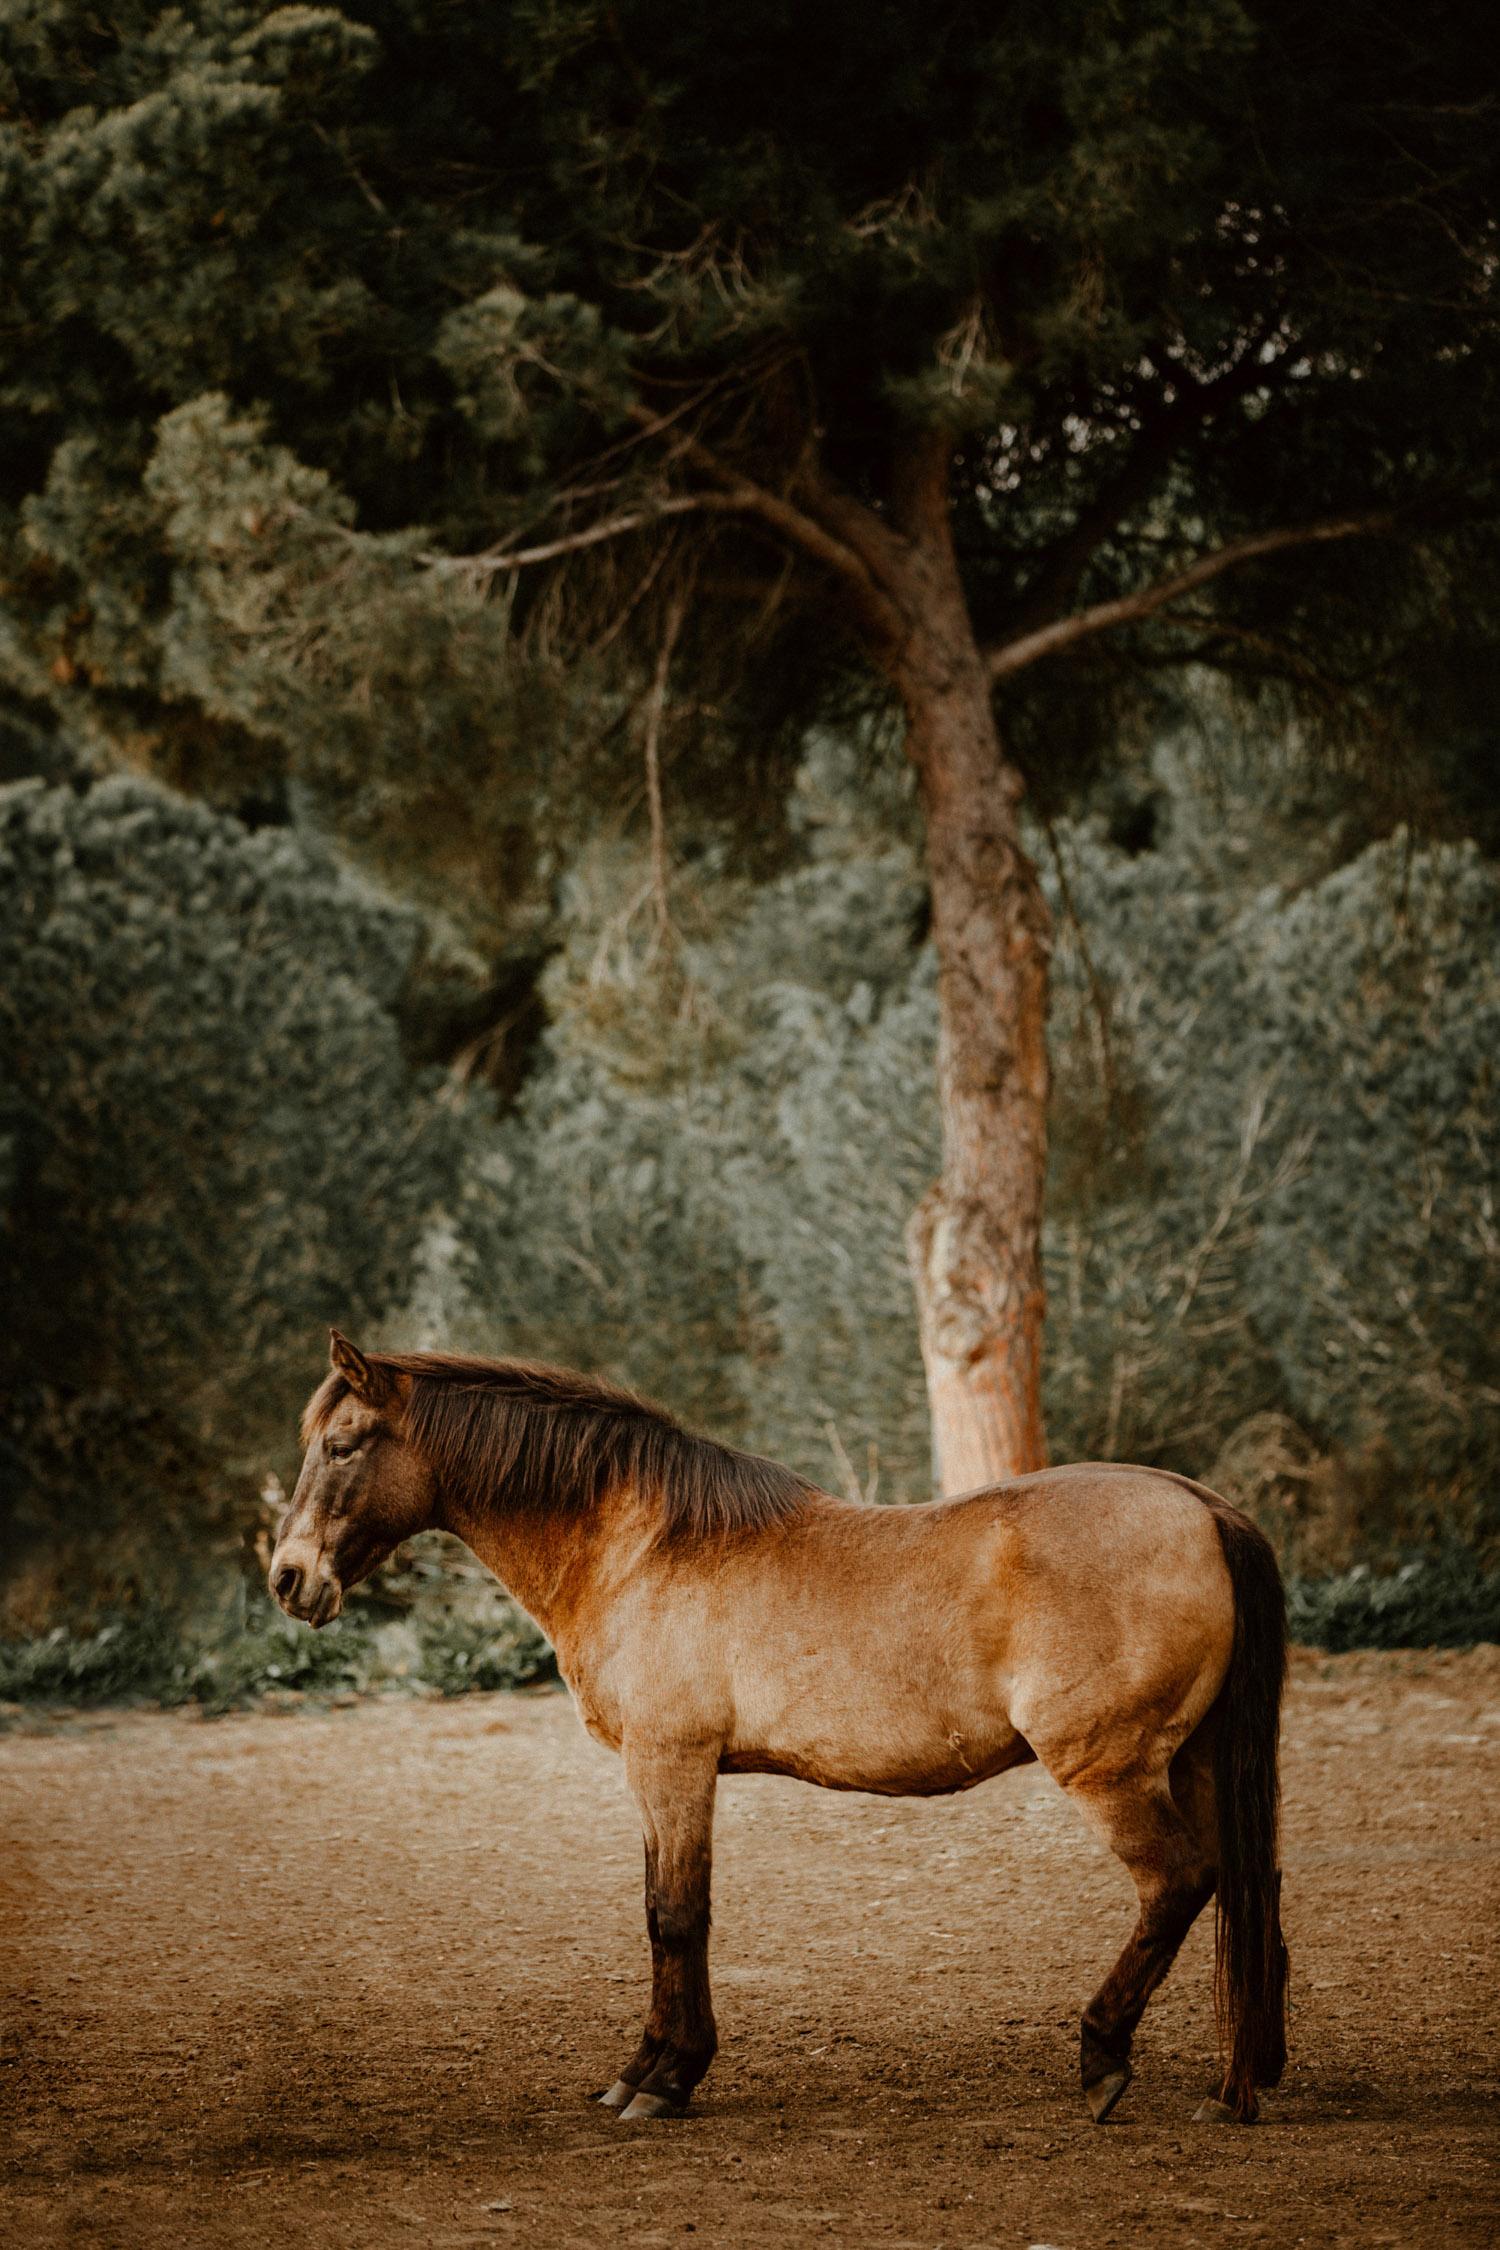 Pferdefotografin Pferdeshooting Pferdefotos Pferdefotografie Workshop Coaching Kurs Bildbearbeitung Photoshop Lightroom Schweiz Tabitha Roth Conil de la Frontera Spanien Andalusien